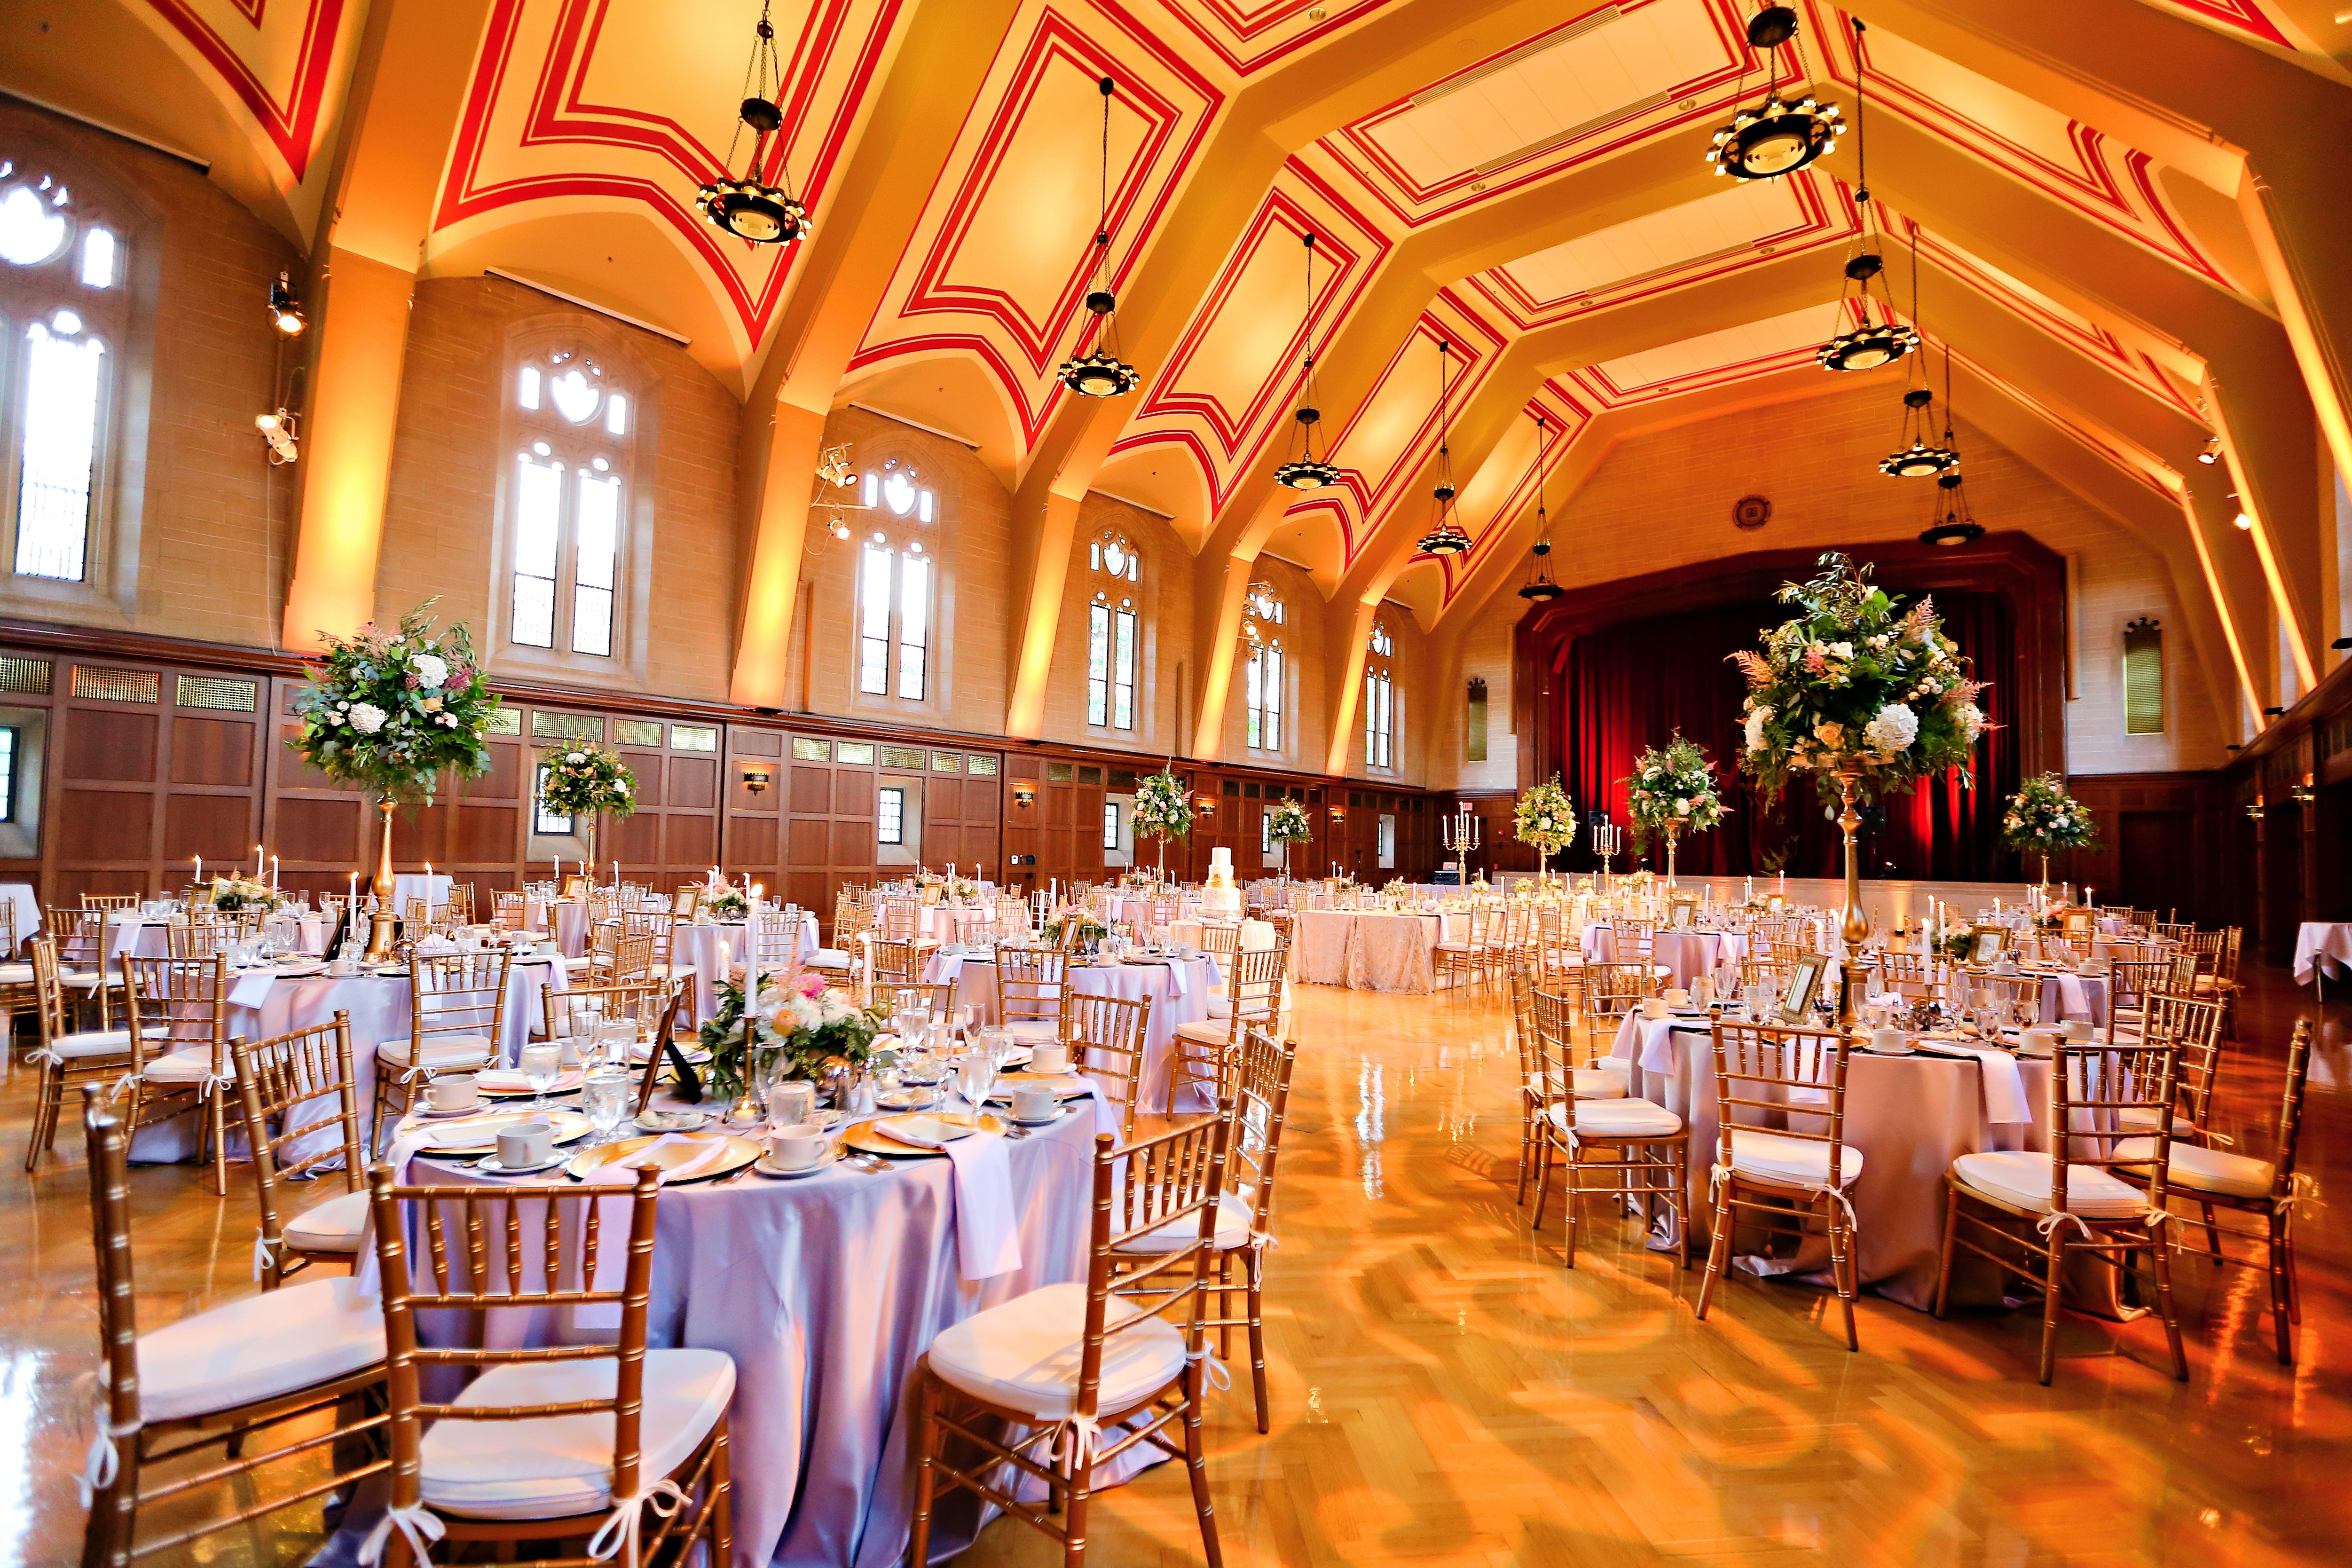 266 meaghan matt indiana university wedding